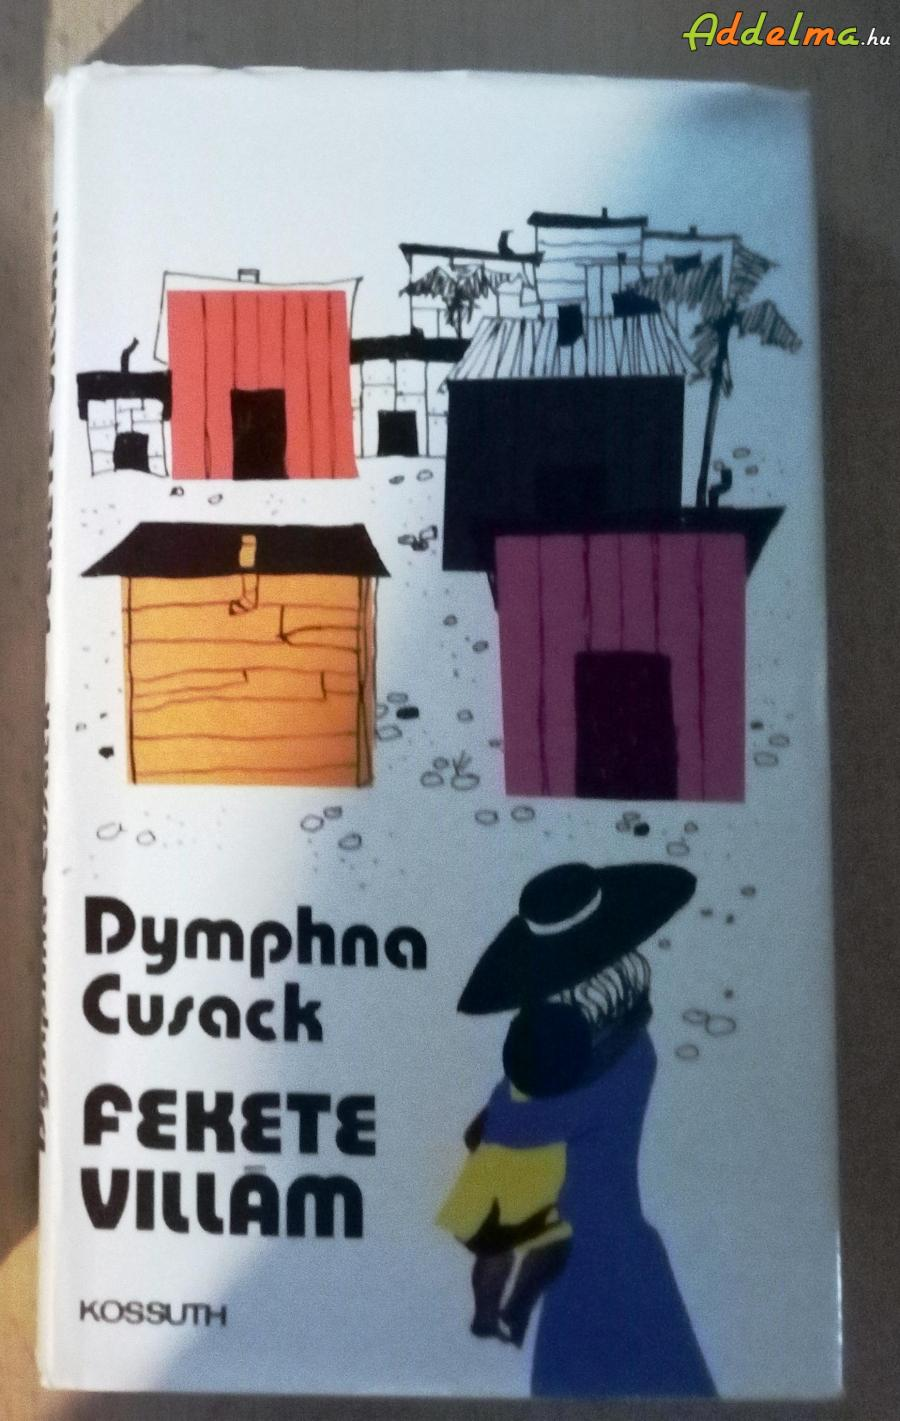 Dymphna Cusack: Fekete Villám (Kossuth/1975)